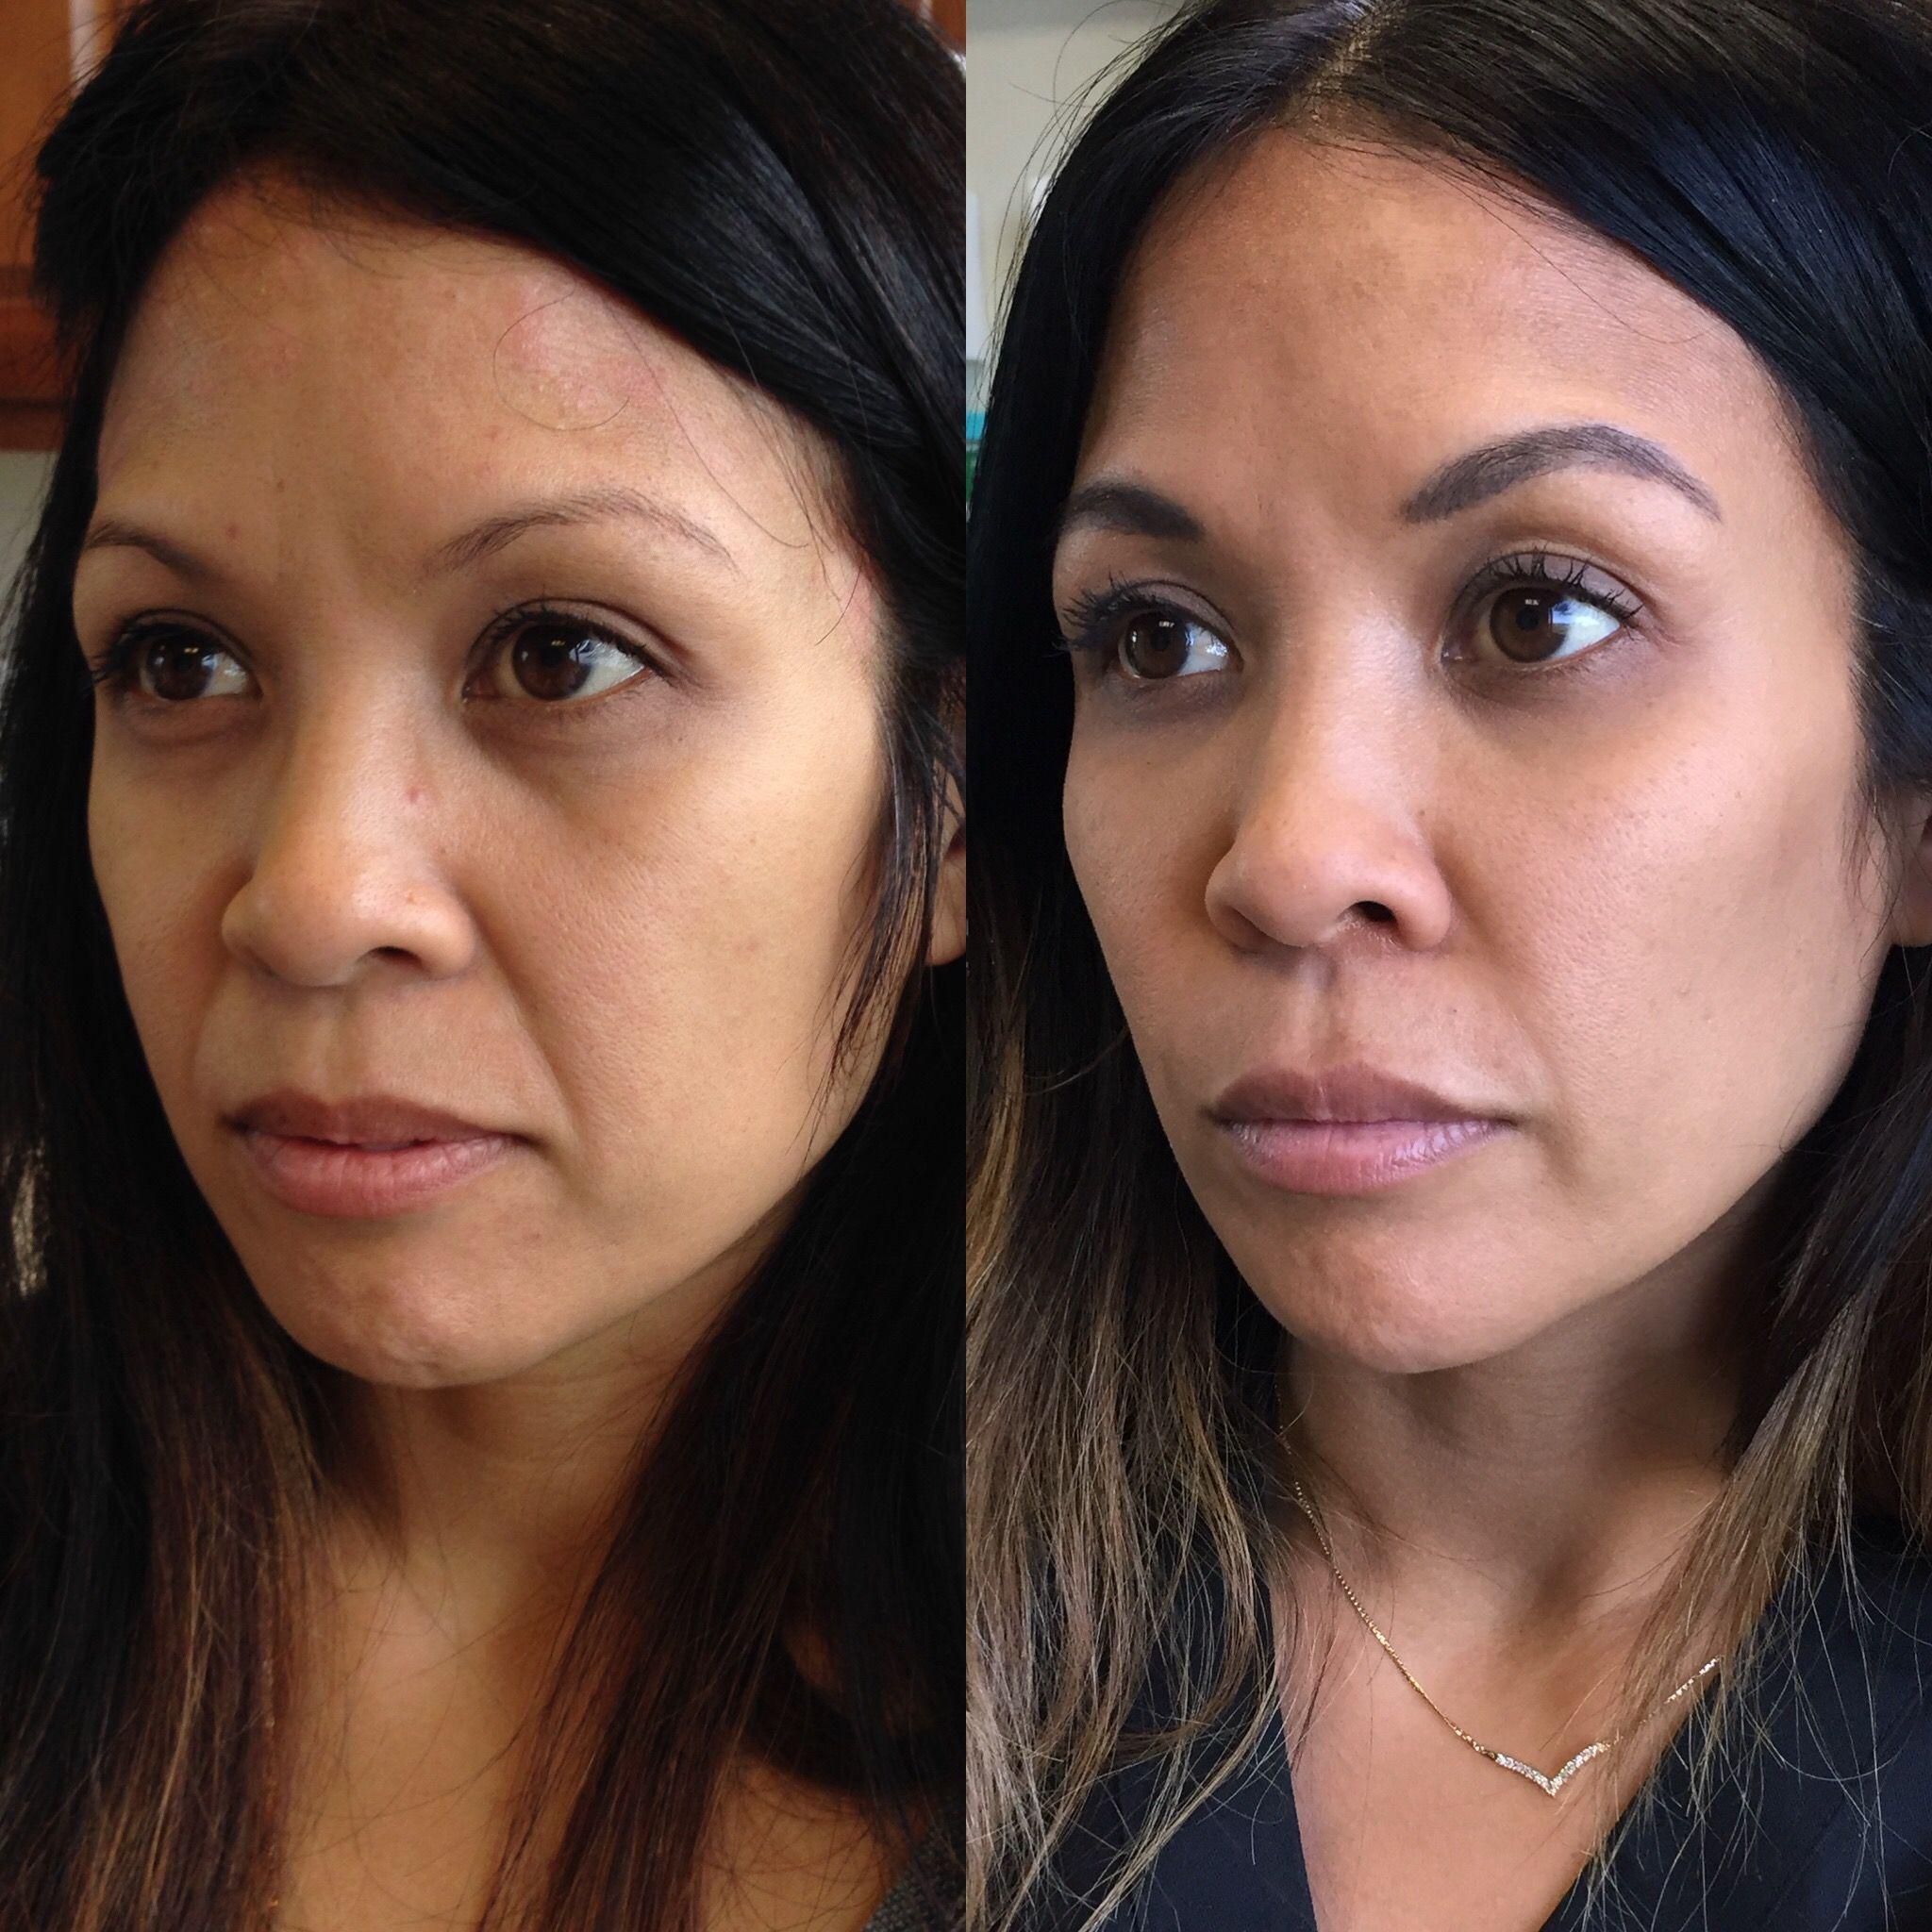 Dermal fillers for nasolabial folds and cheek enhancement